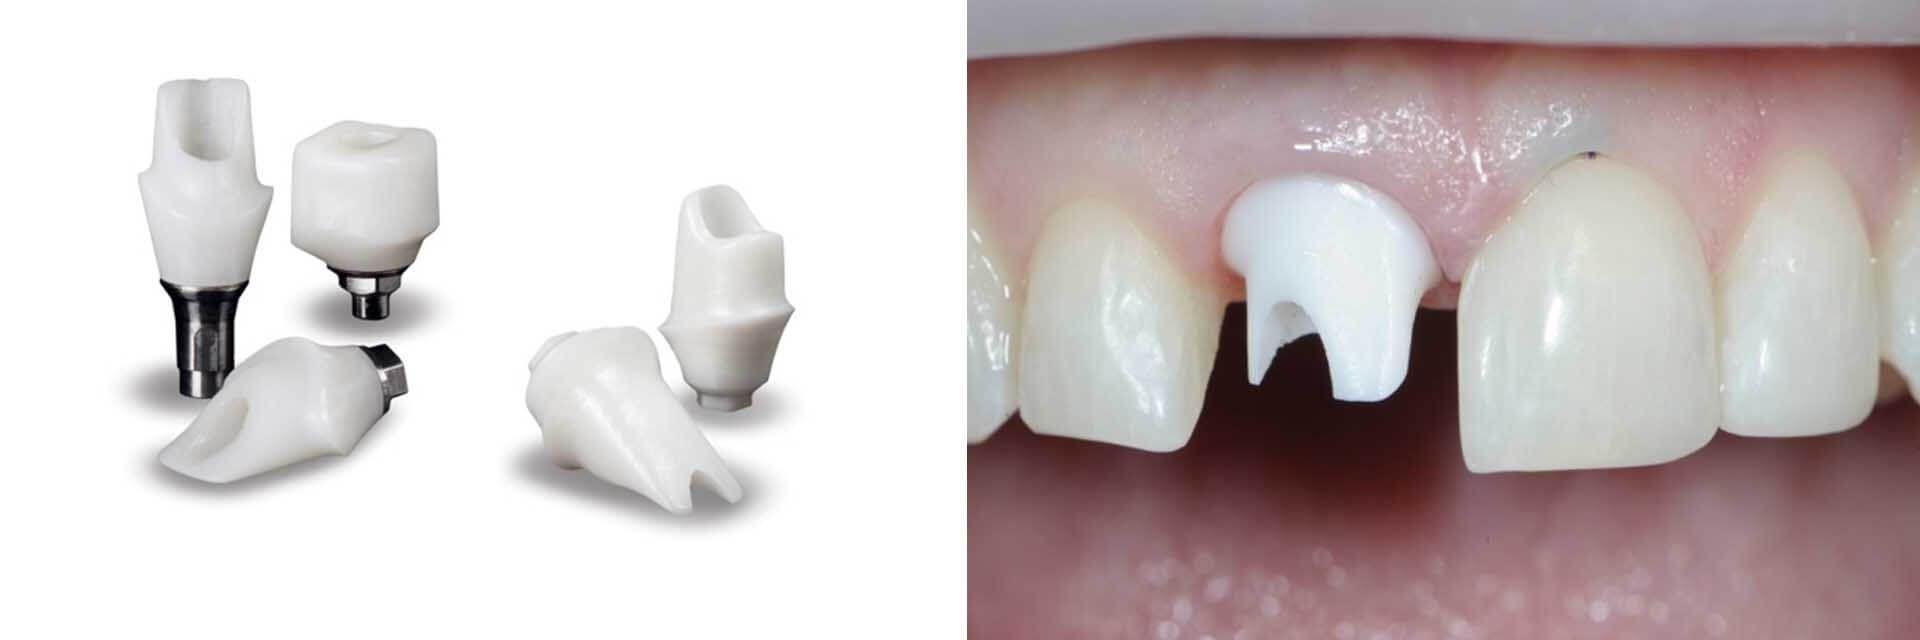 Zirconia Implant Dentistry Implant Dentistry Free Dental Implants Implants